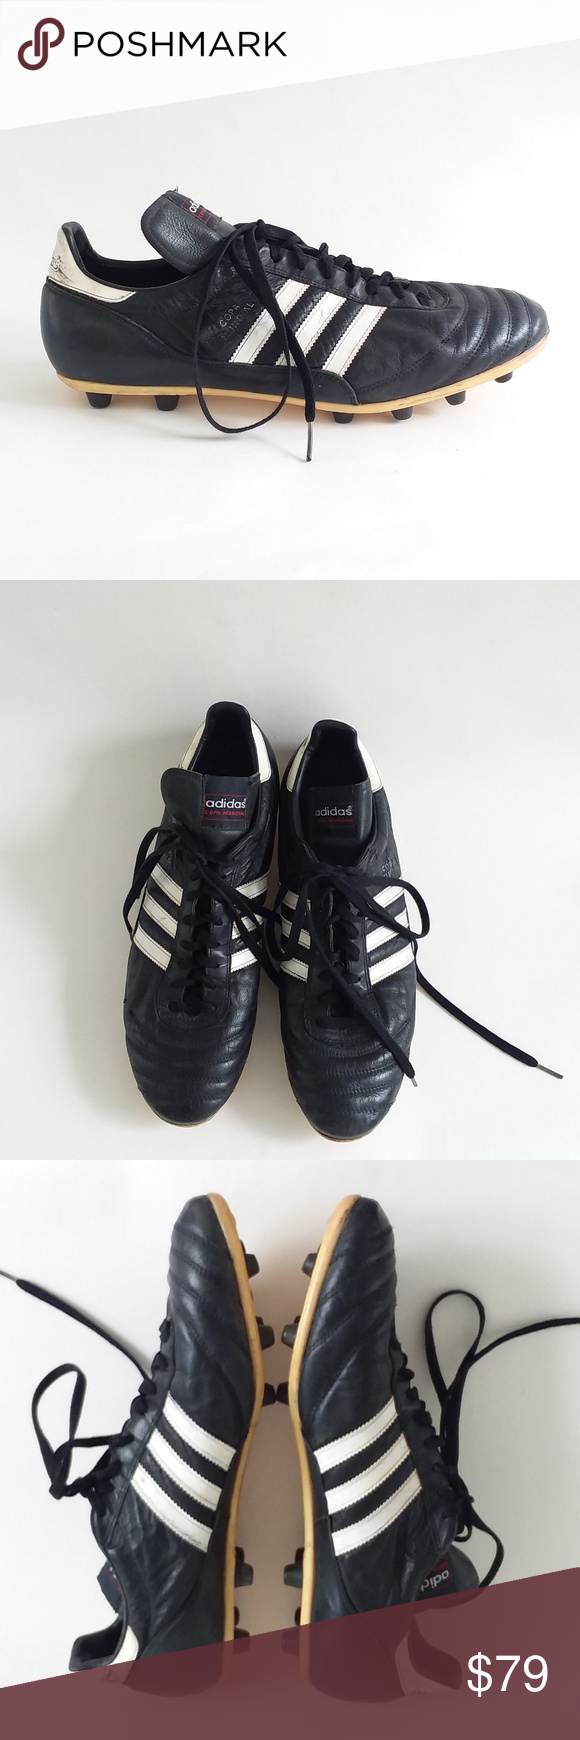 tragedia Samuel Gobernador  Adidas Copa Mundial Soccer Cleats Shoes Size 15 | Cleats shoes, Soccer  cleats, Mens soccer cleats